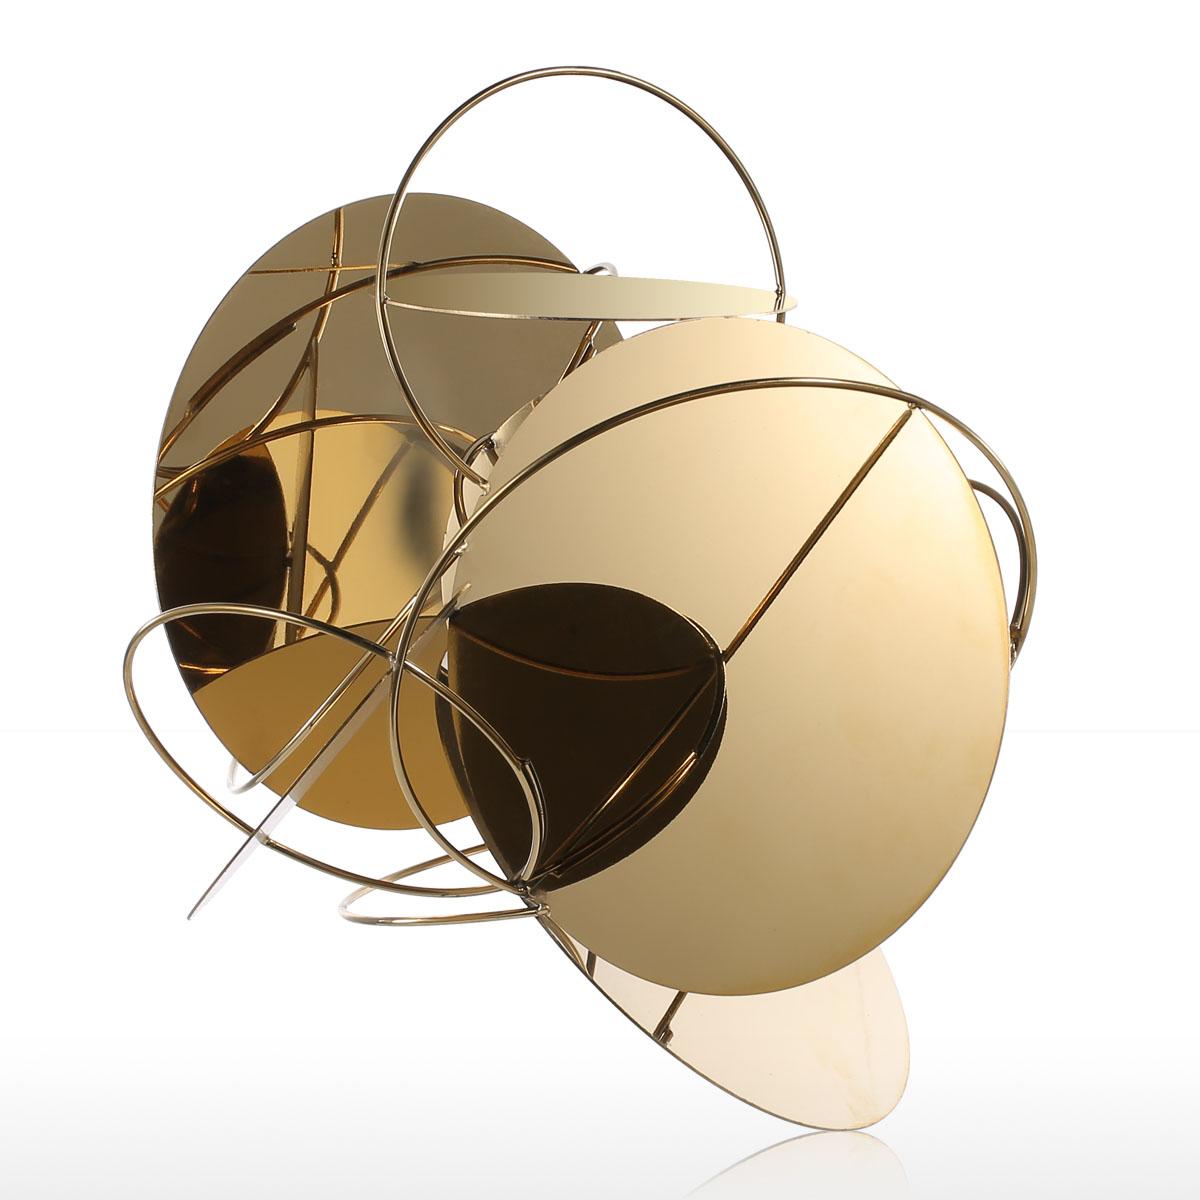 Tooarts Goldener Spiegel Moderne Skulptur Abstrakte Verzierung ...